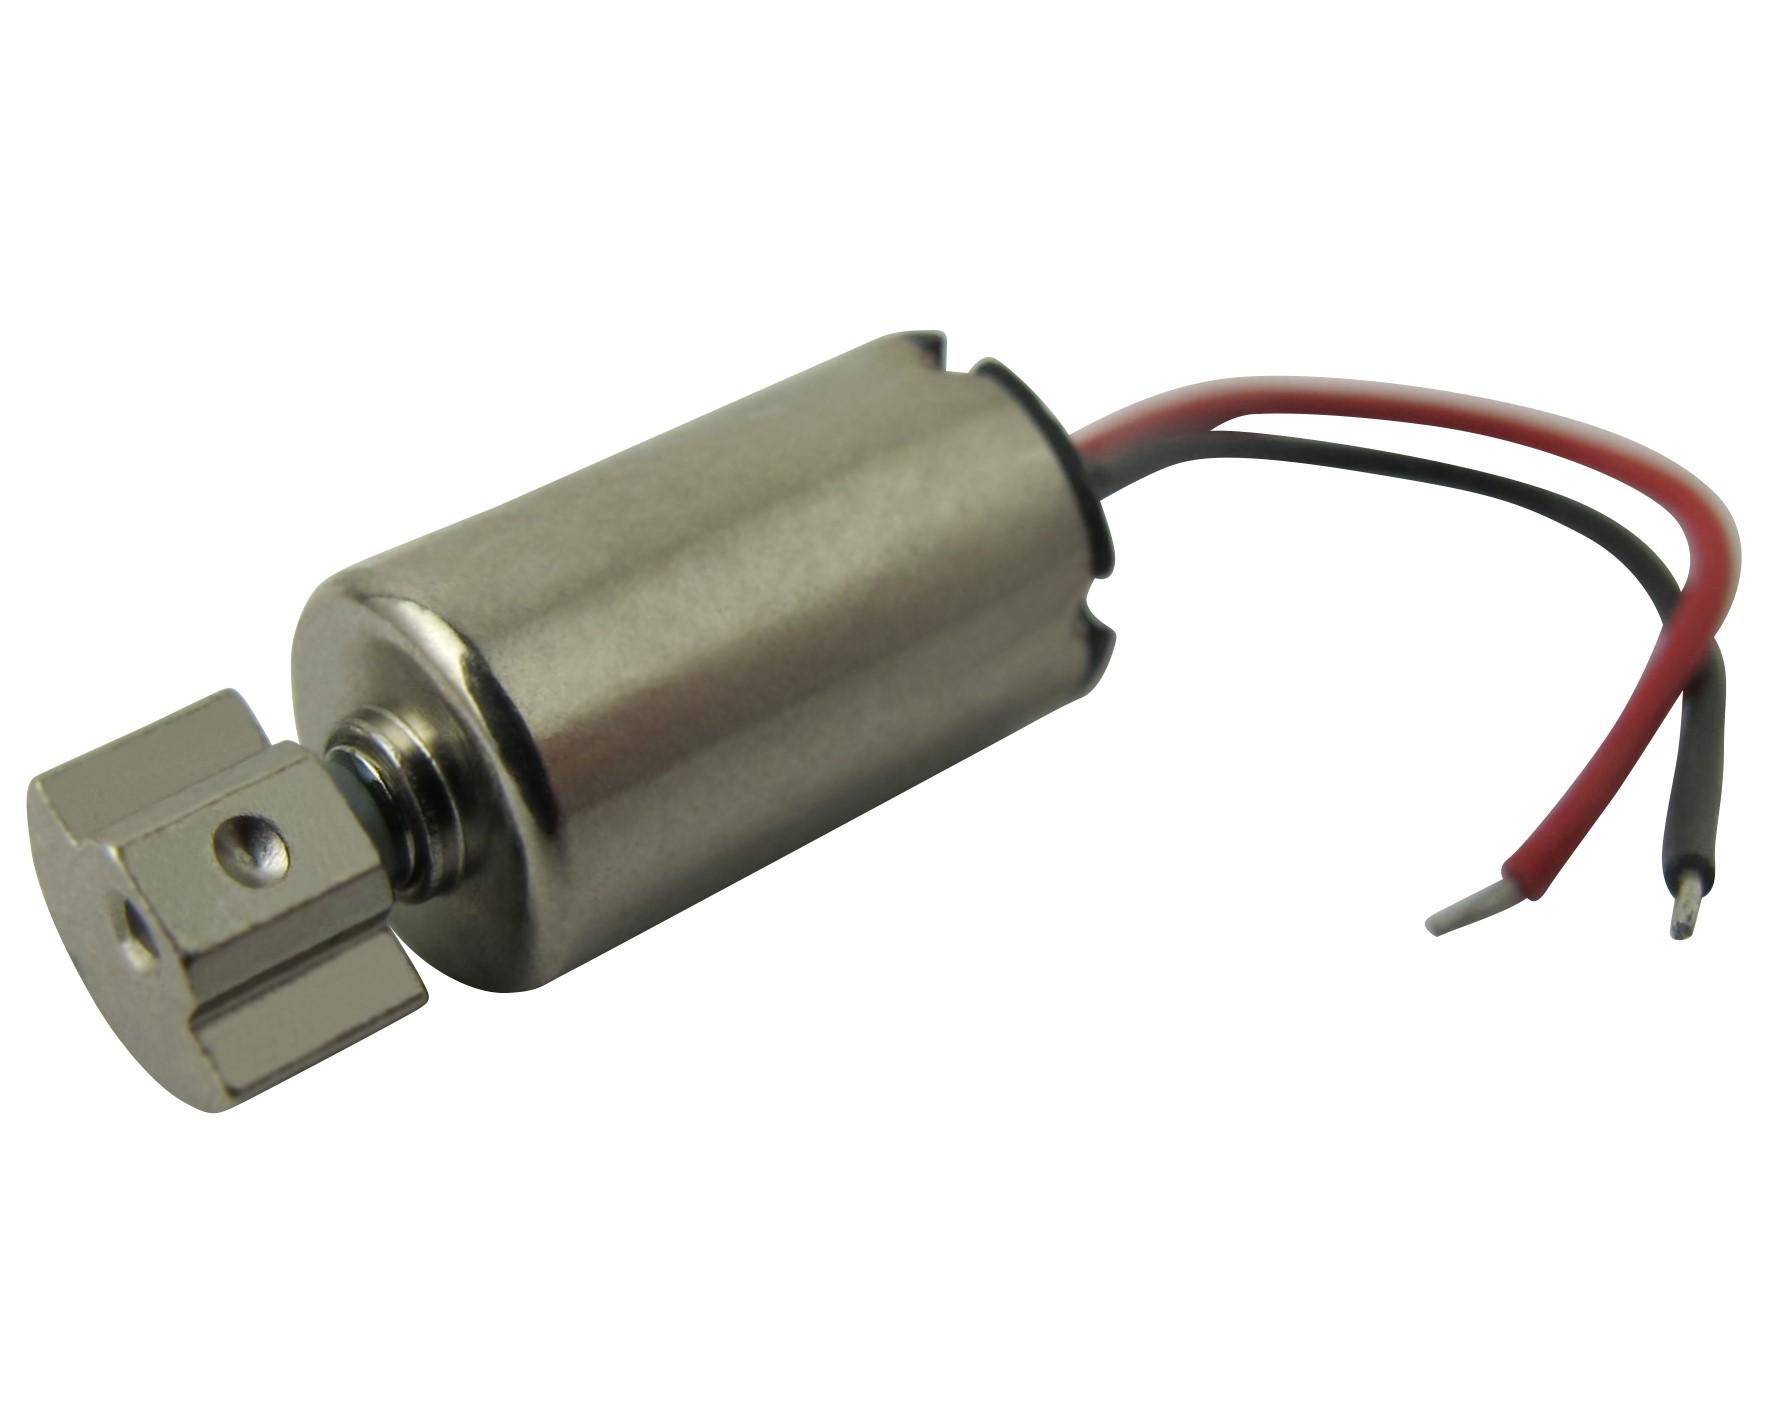 Z6SL2B0120001 Cylindrical Vibrator Motor